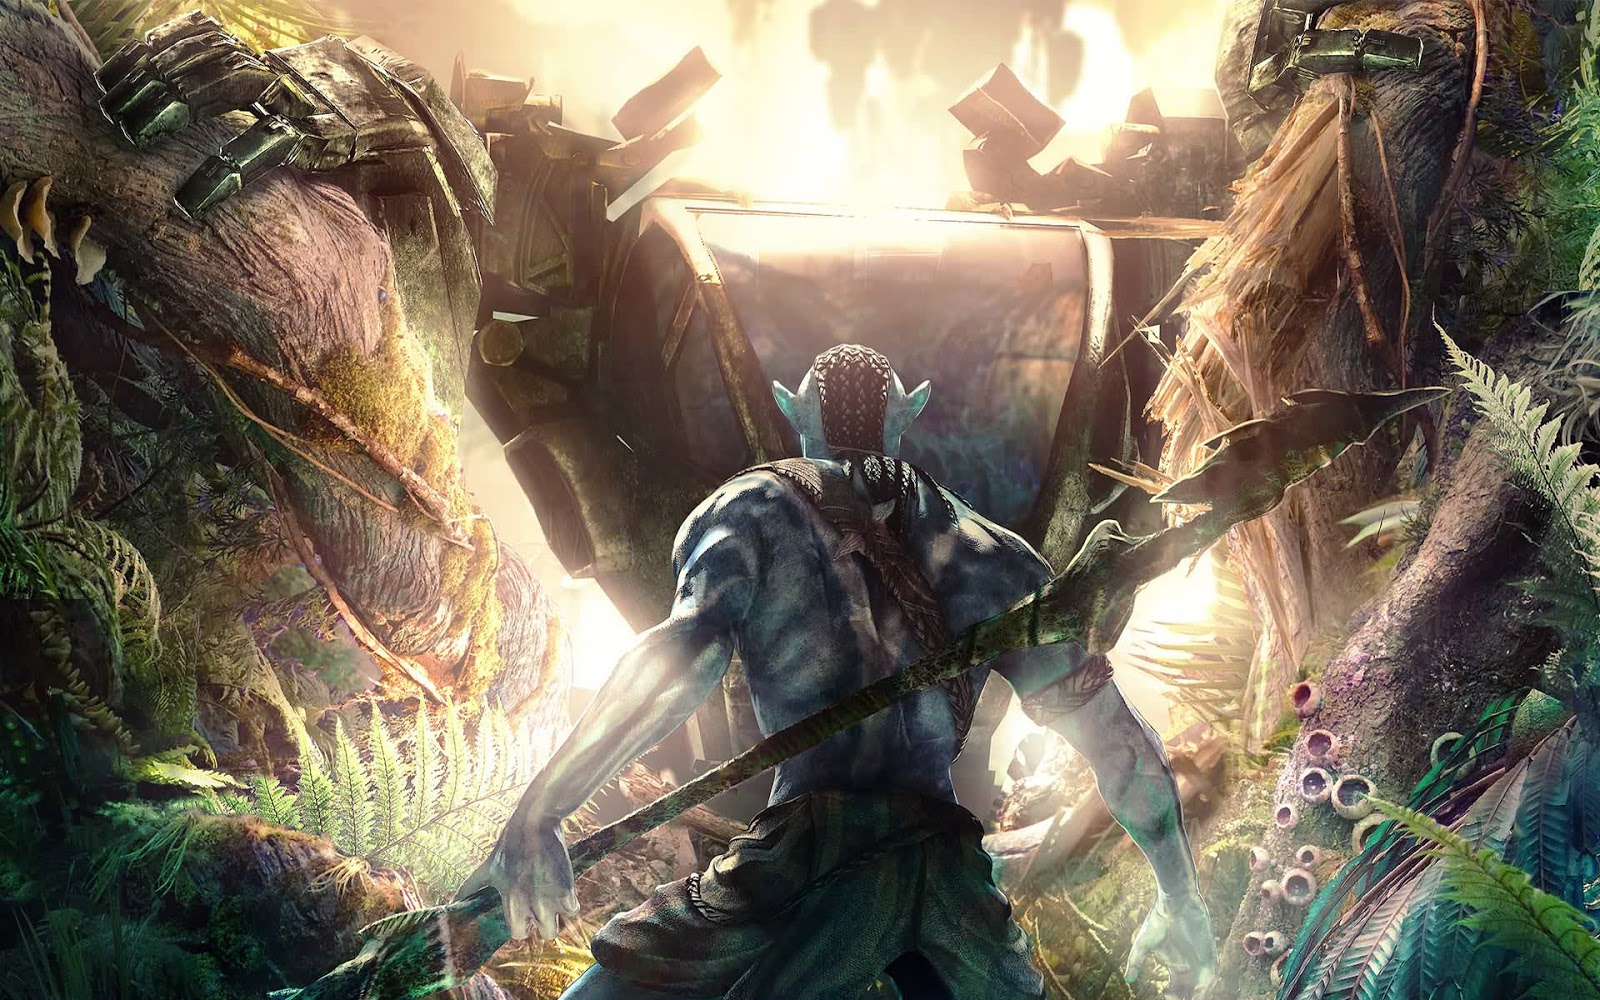 242 <b>Avatar</b> HD <b>Wallpapers</b> | <b>Backgrounds</b> - <b>Wallpaper</b> Abyss